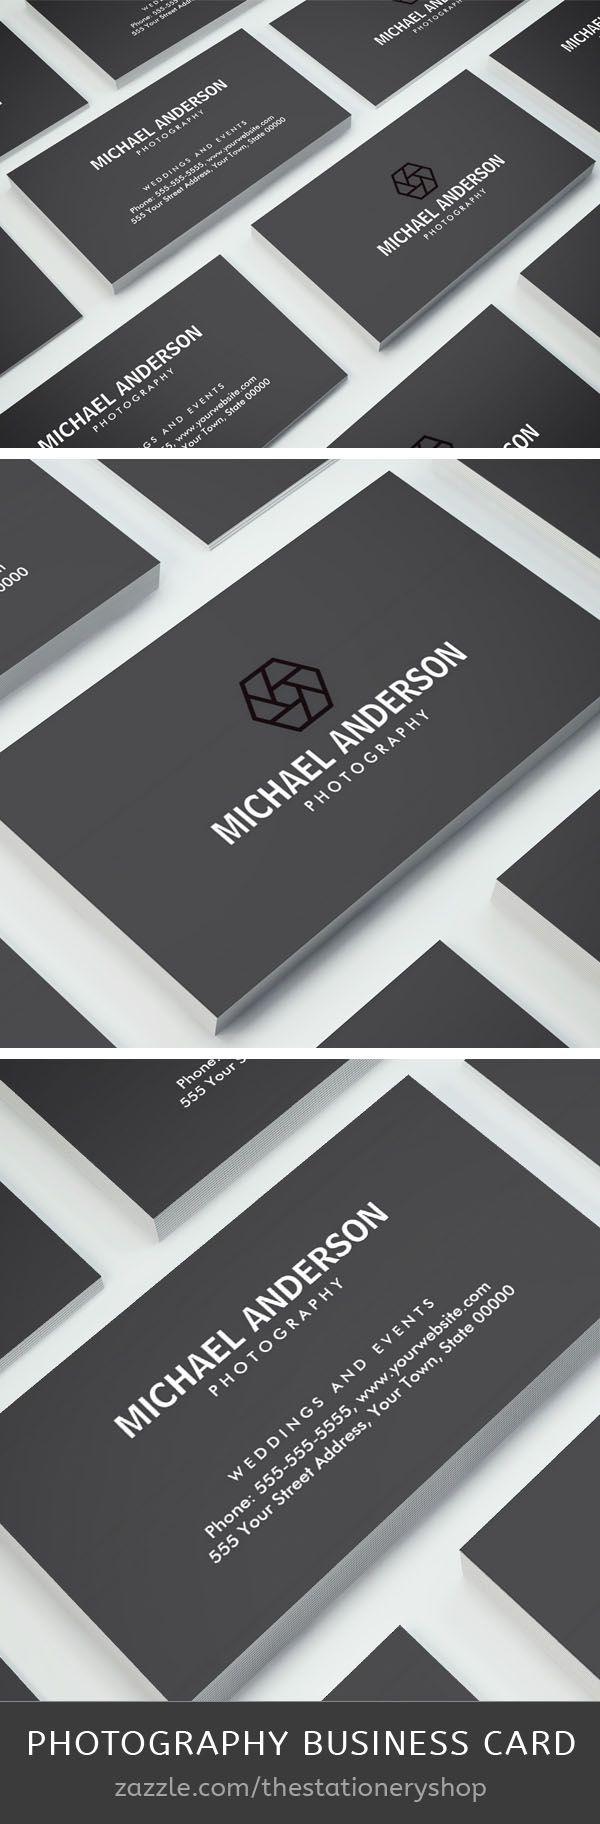 Modern dark gray photography business card pinterest cartes de modern dark gray photography business card pinterest cartes de visita visita e carto reheart Choice Image